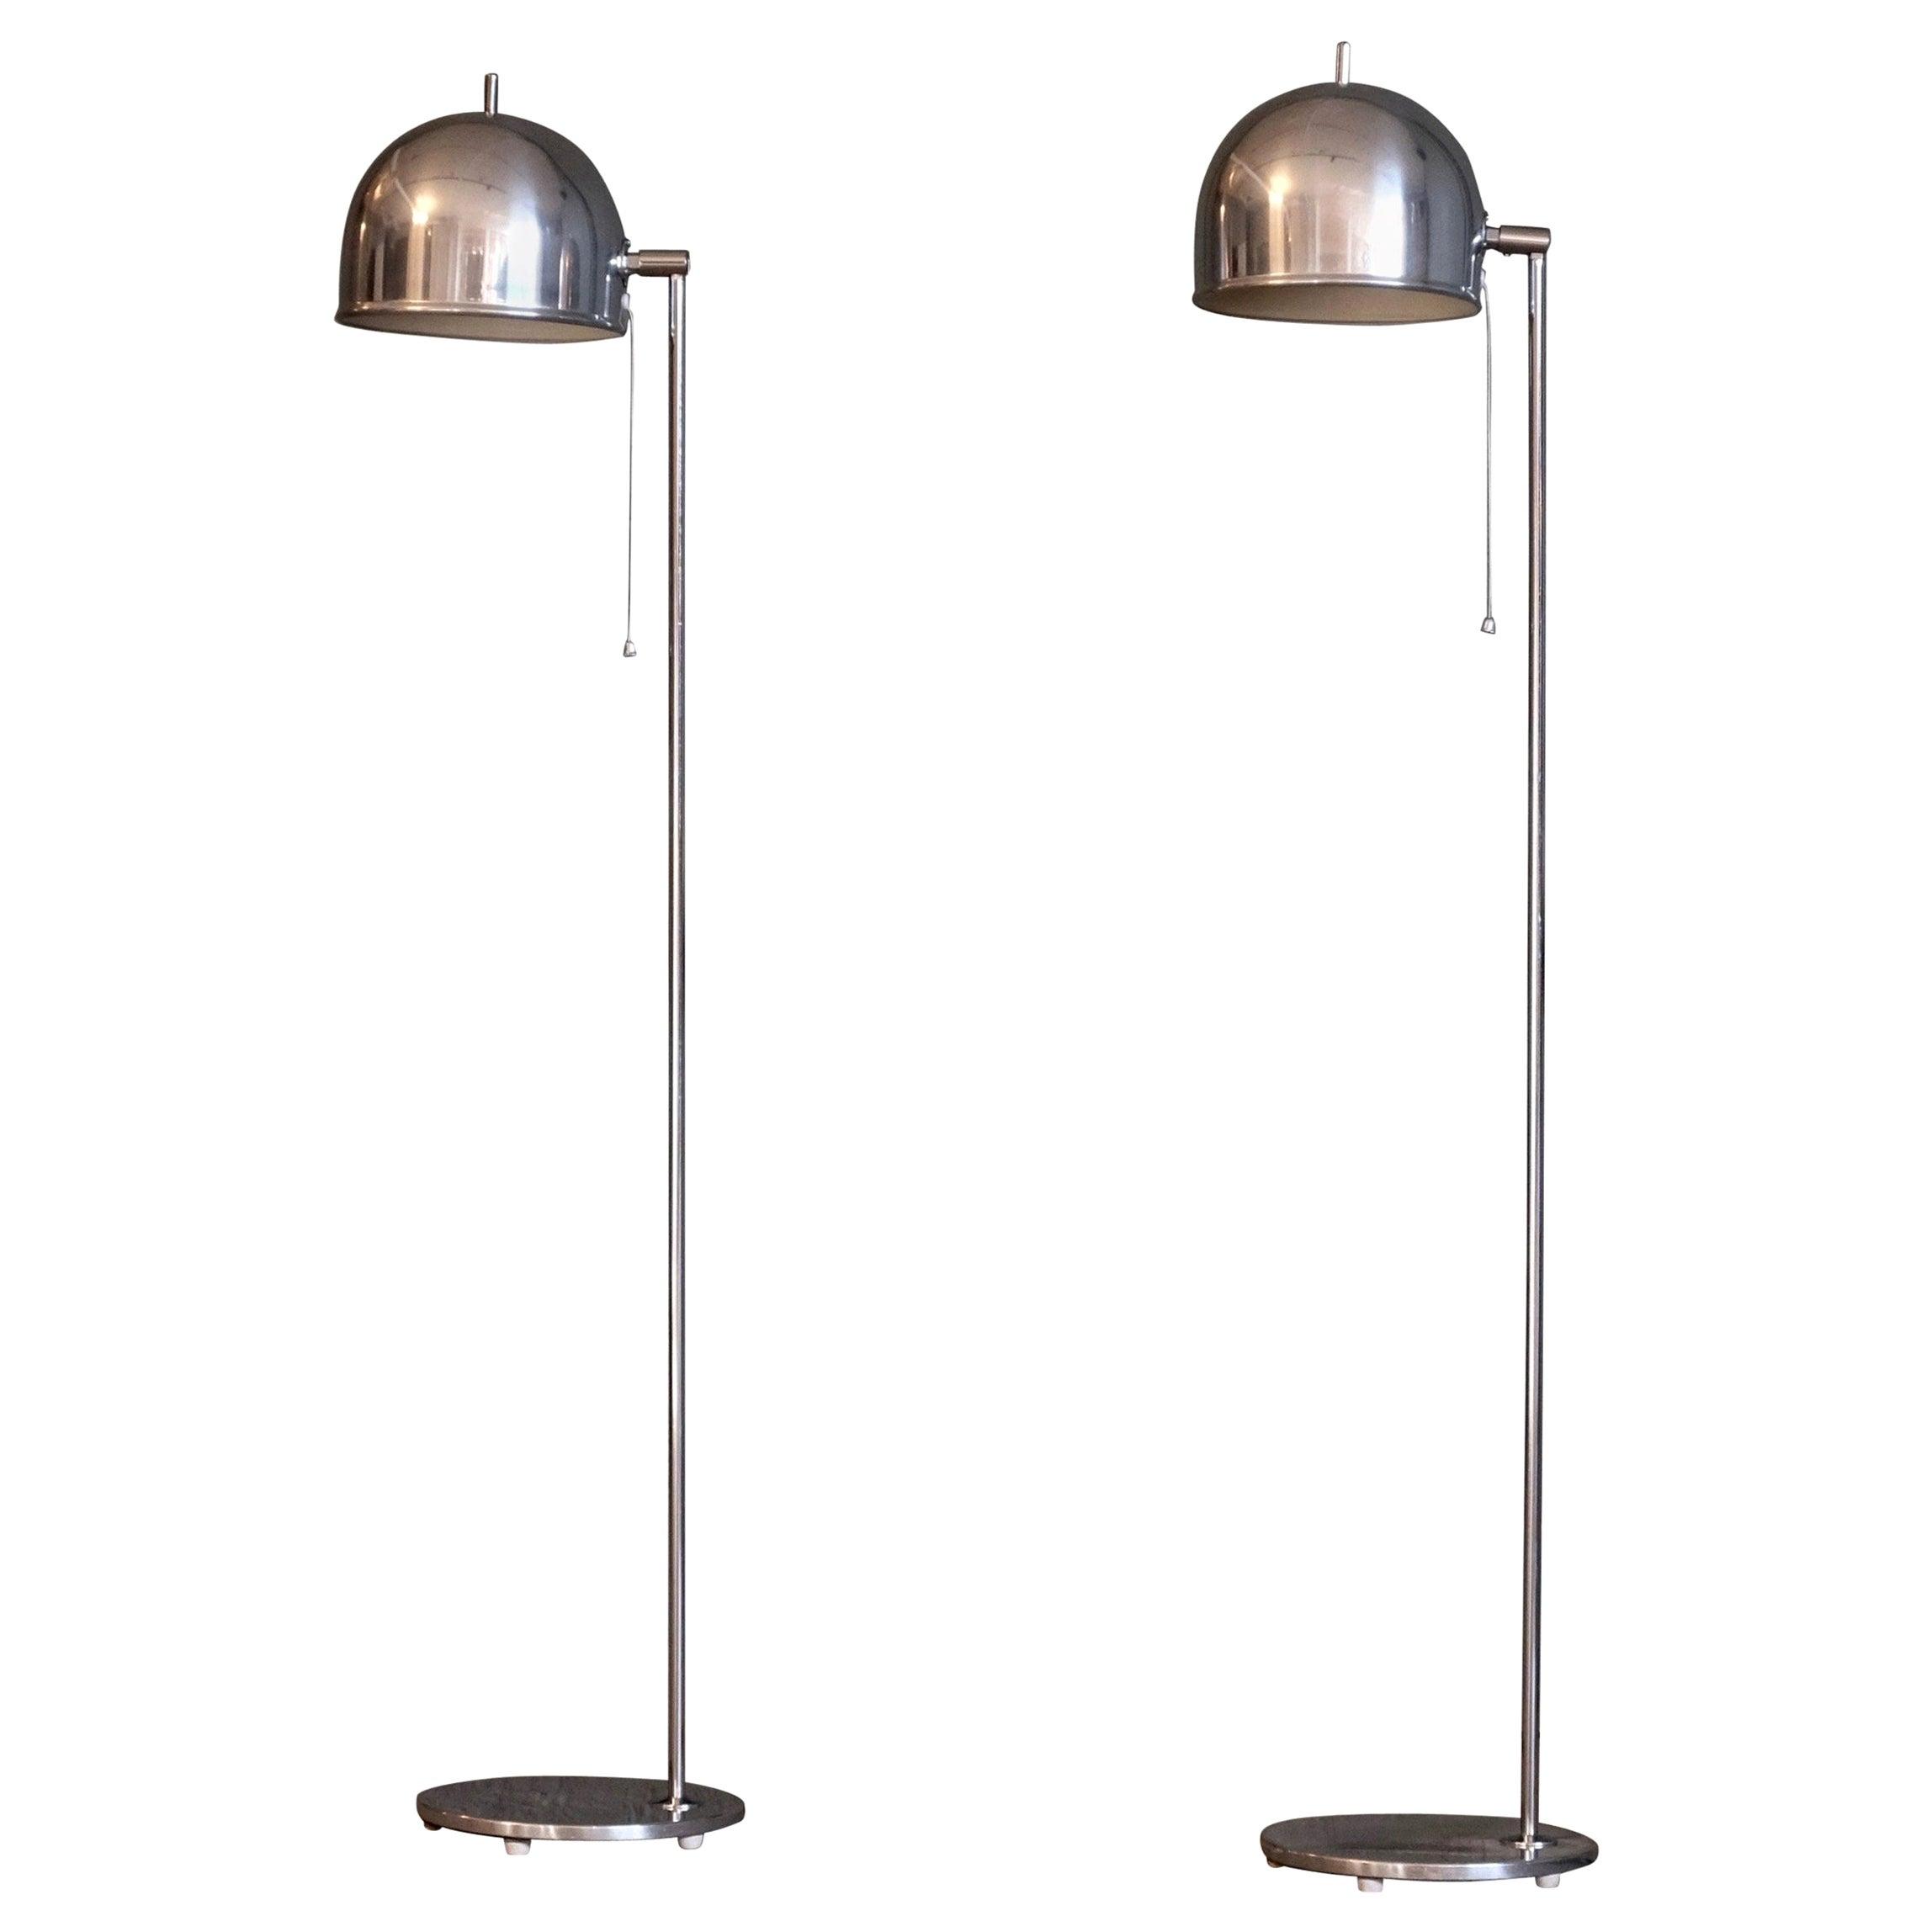 Pair of Floor Lamps Model G-075 by Bergboms, Sweden, 1960s